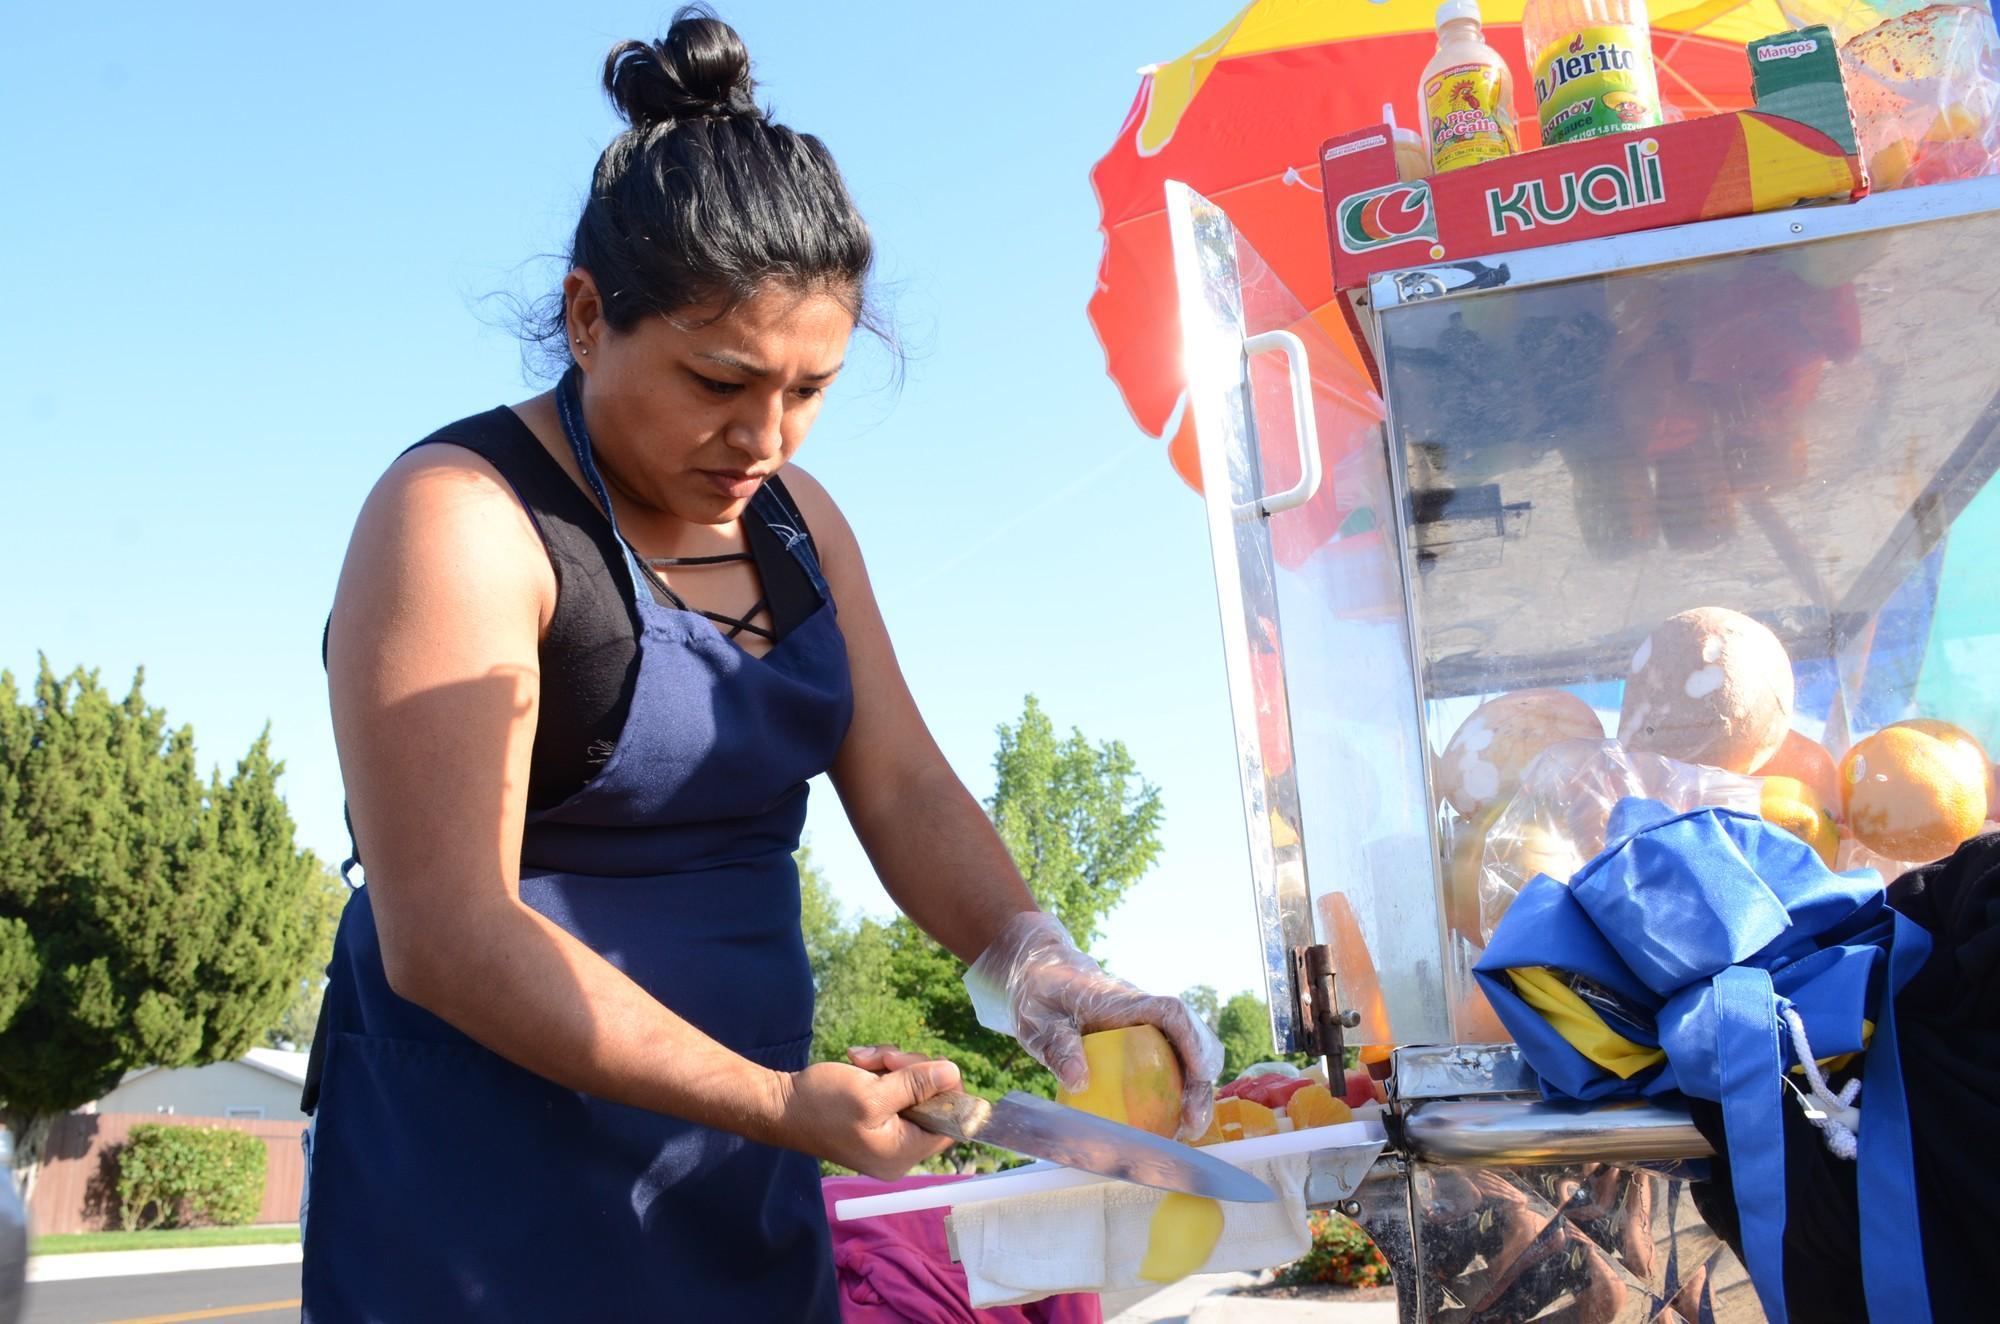 Woman peels mango